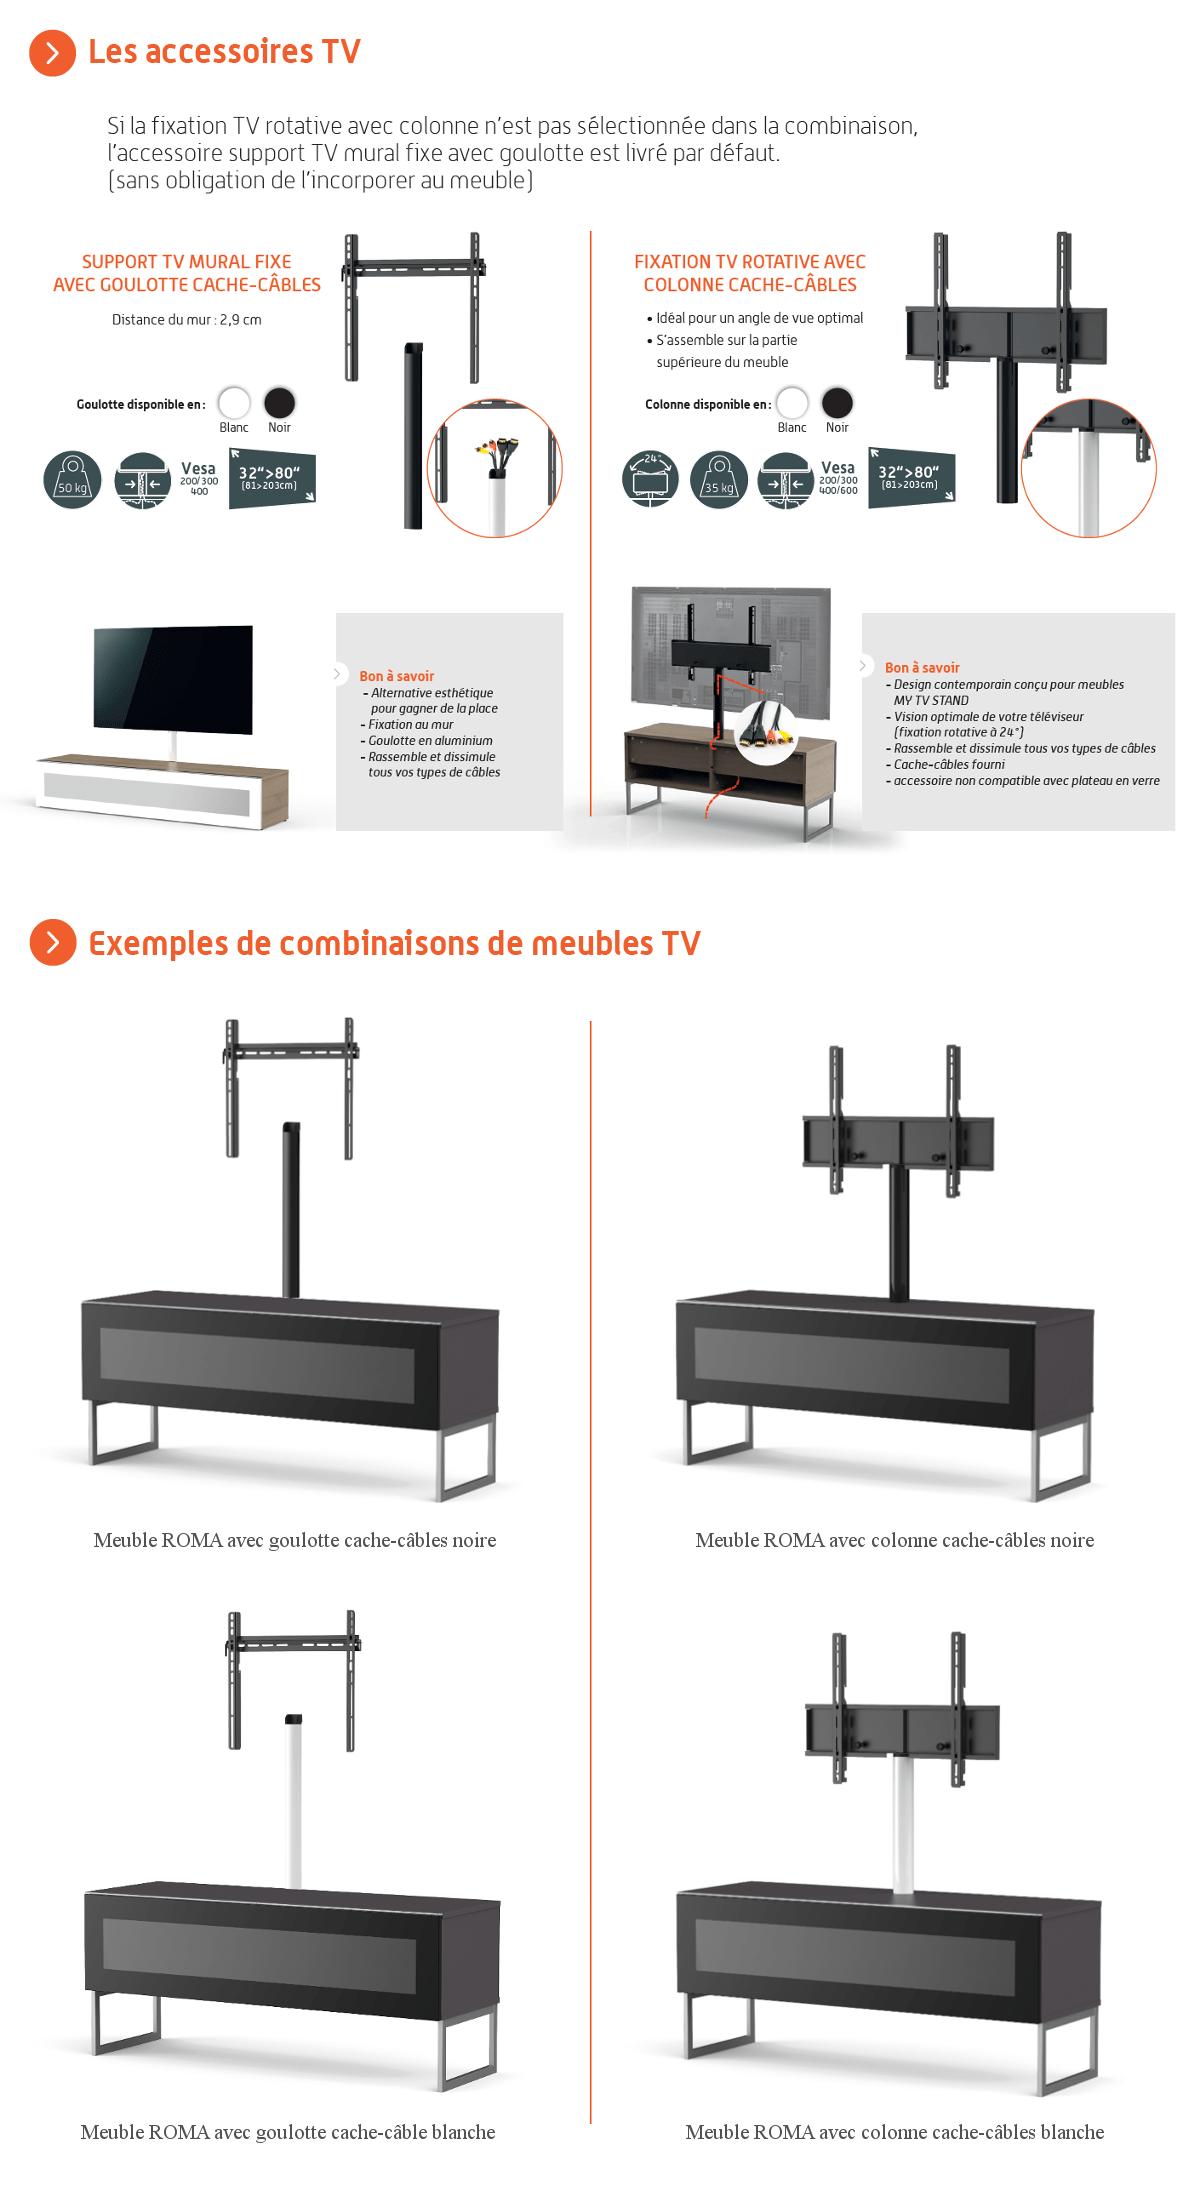 Meuble Tv Avec Cache Fils maliconi bari 120 meuble tv - longueur 120 cm - demi-porte